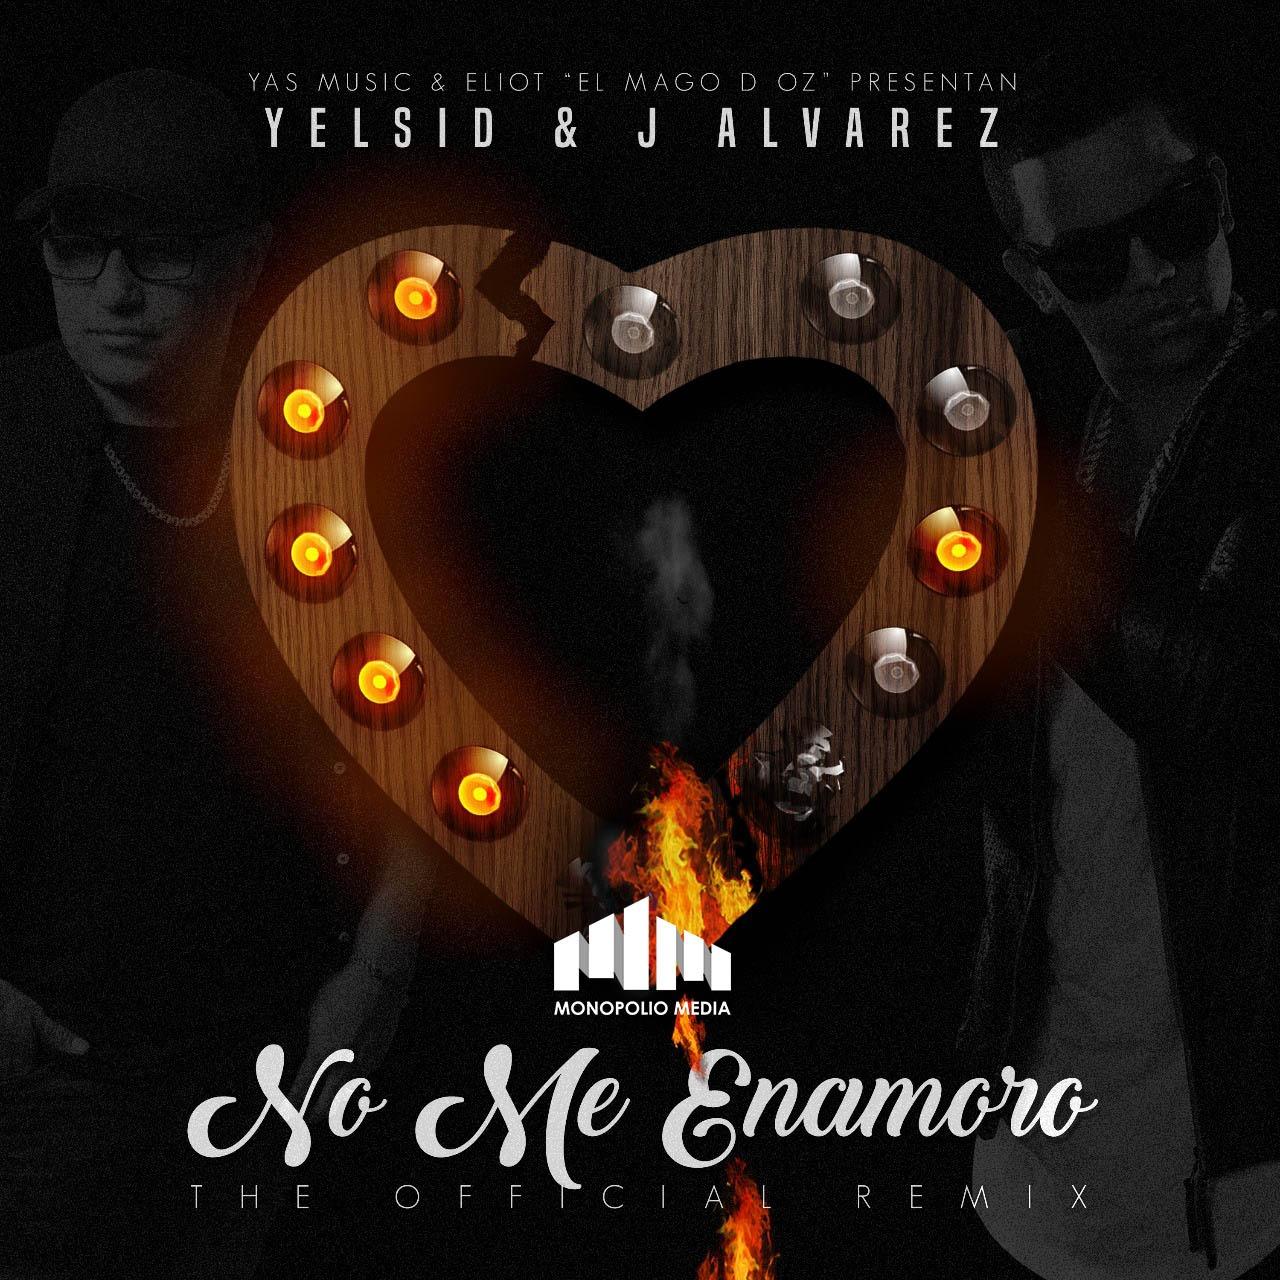 Yelsid Ft. J Alvarez No Me Enamoro Official Remix - Yelsid, J Alvarez - No Me Enamoro (Official Remix)